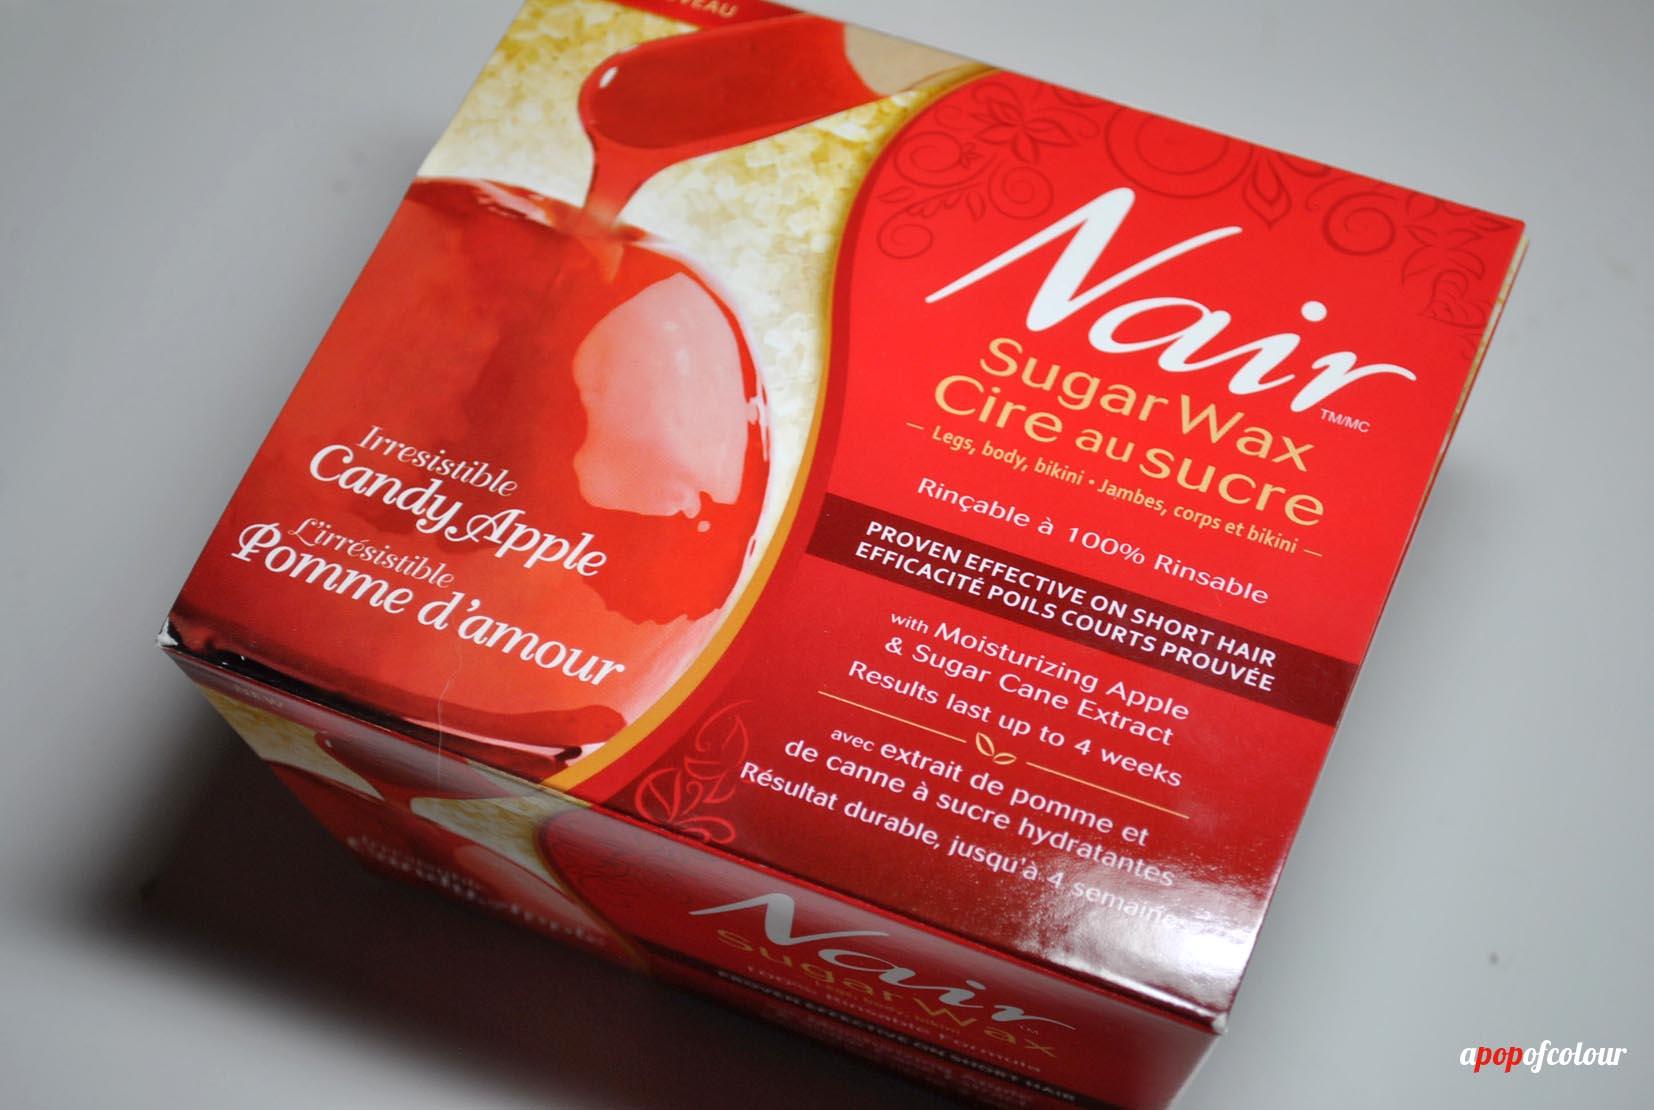 Sweet & smooth: Nair Candy Apple Sugar Wax - A Pop of Colour